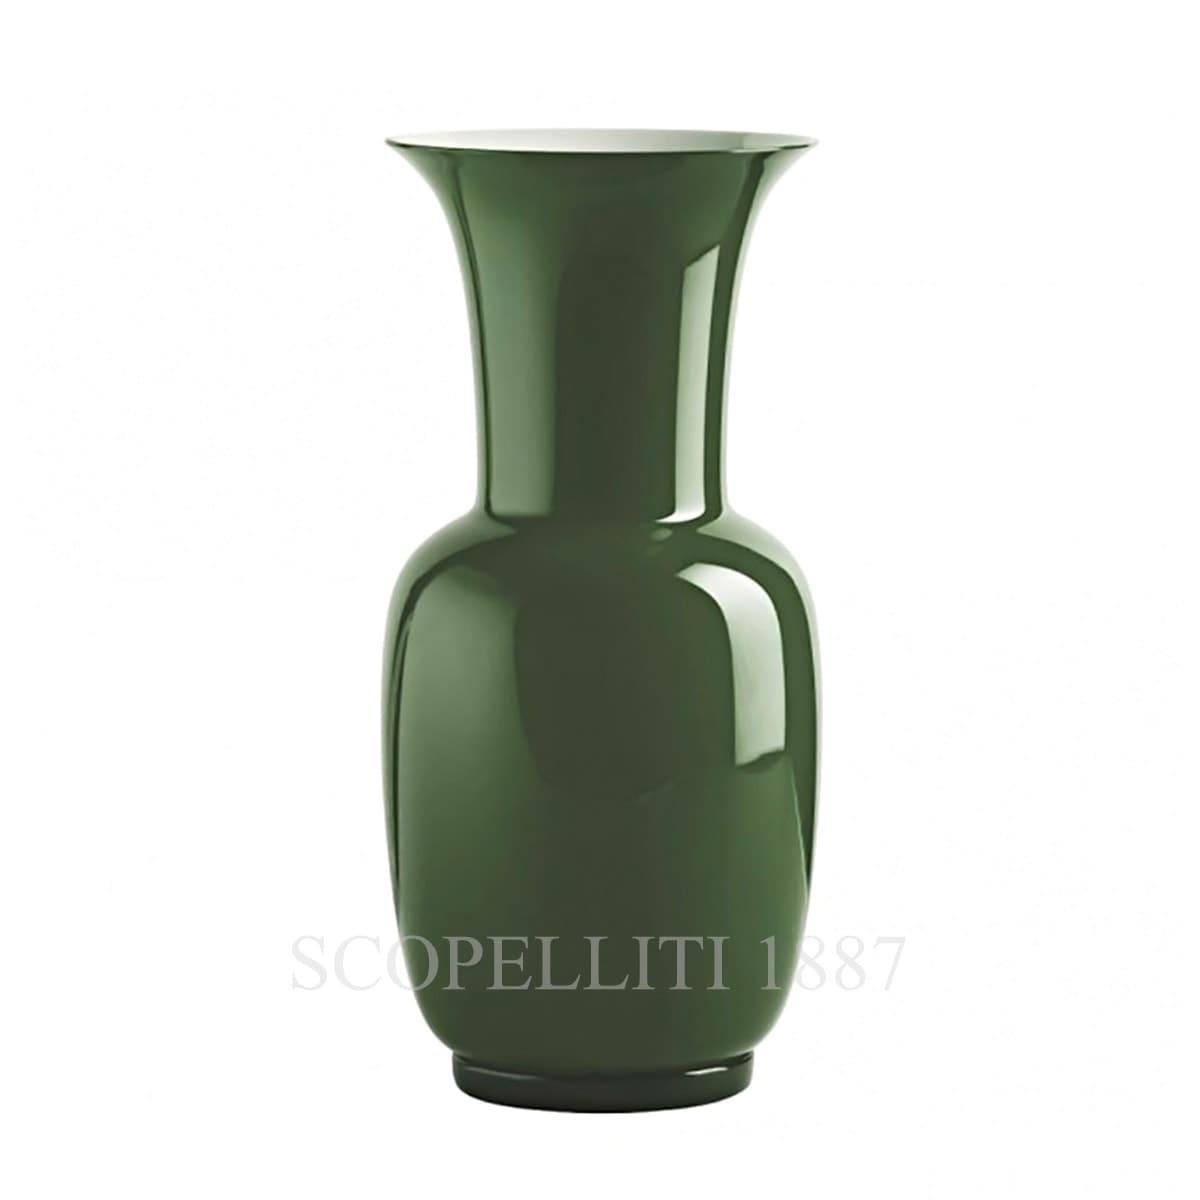 venini opaline italian murano glass vase green